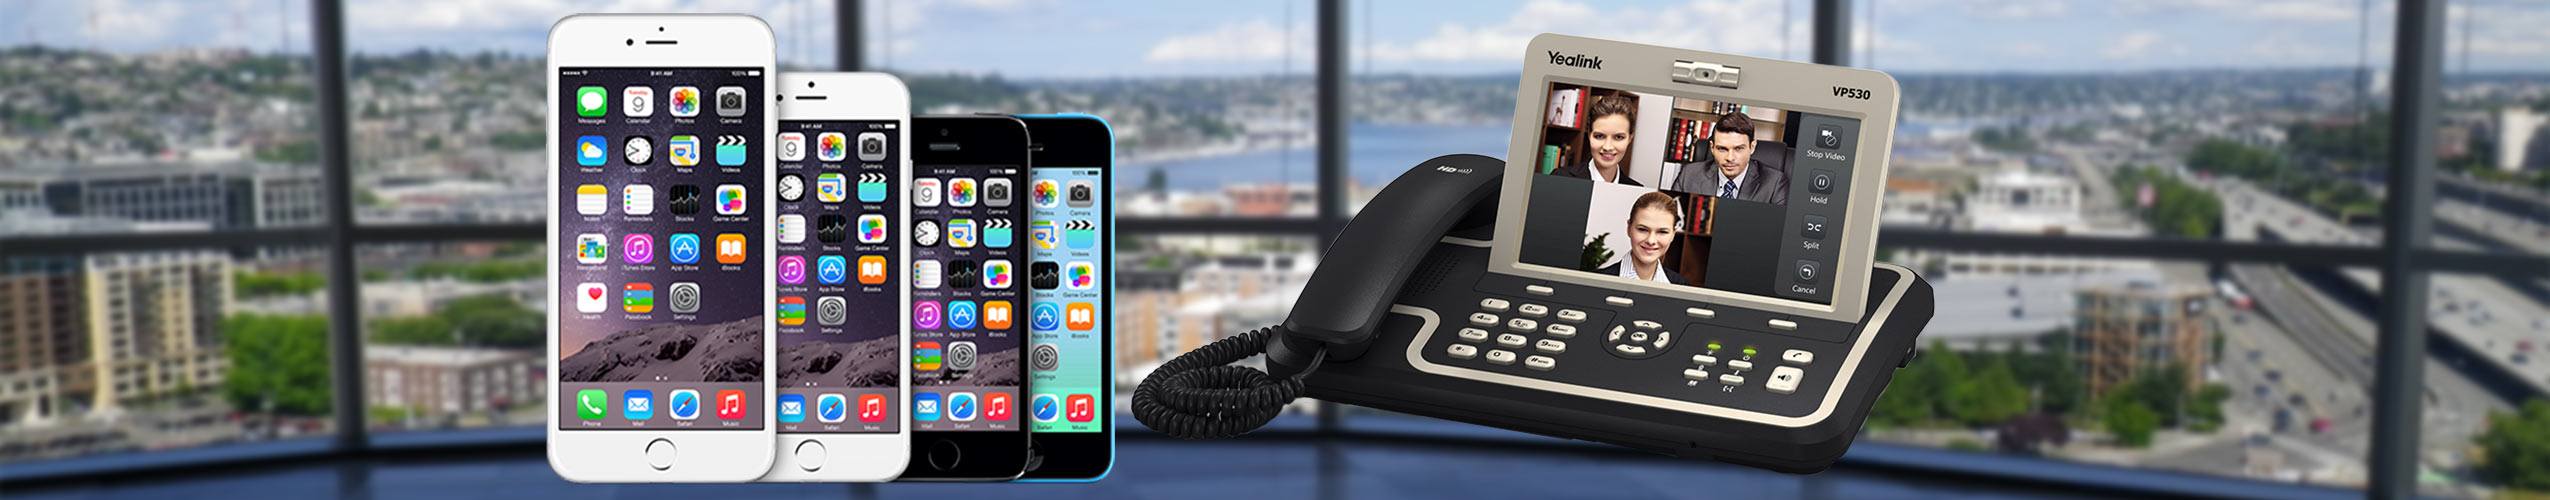 Telefonie1